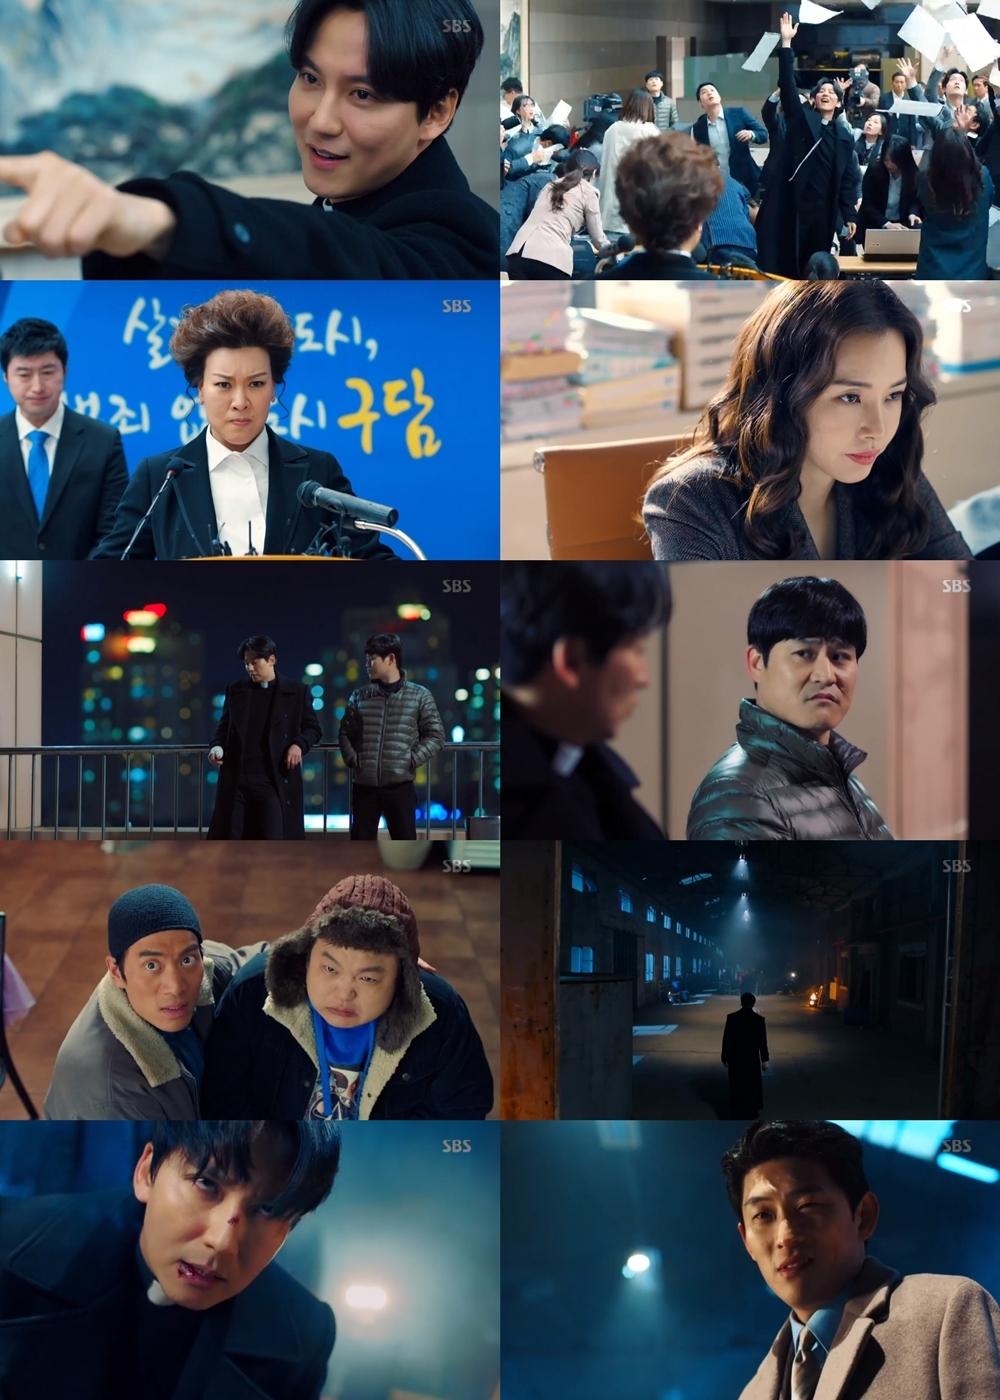 [N시청률] '열혈사제' 김남길X이하늬 분노의 박치기… 최고 '21.7%'